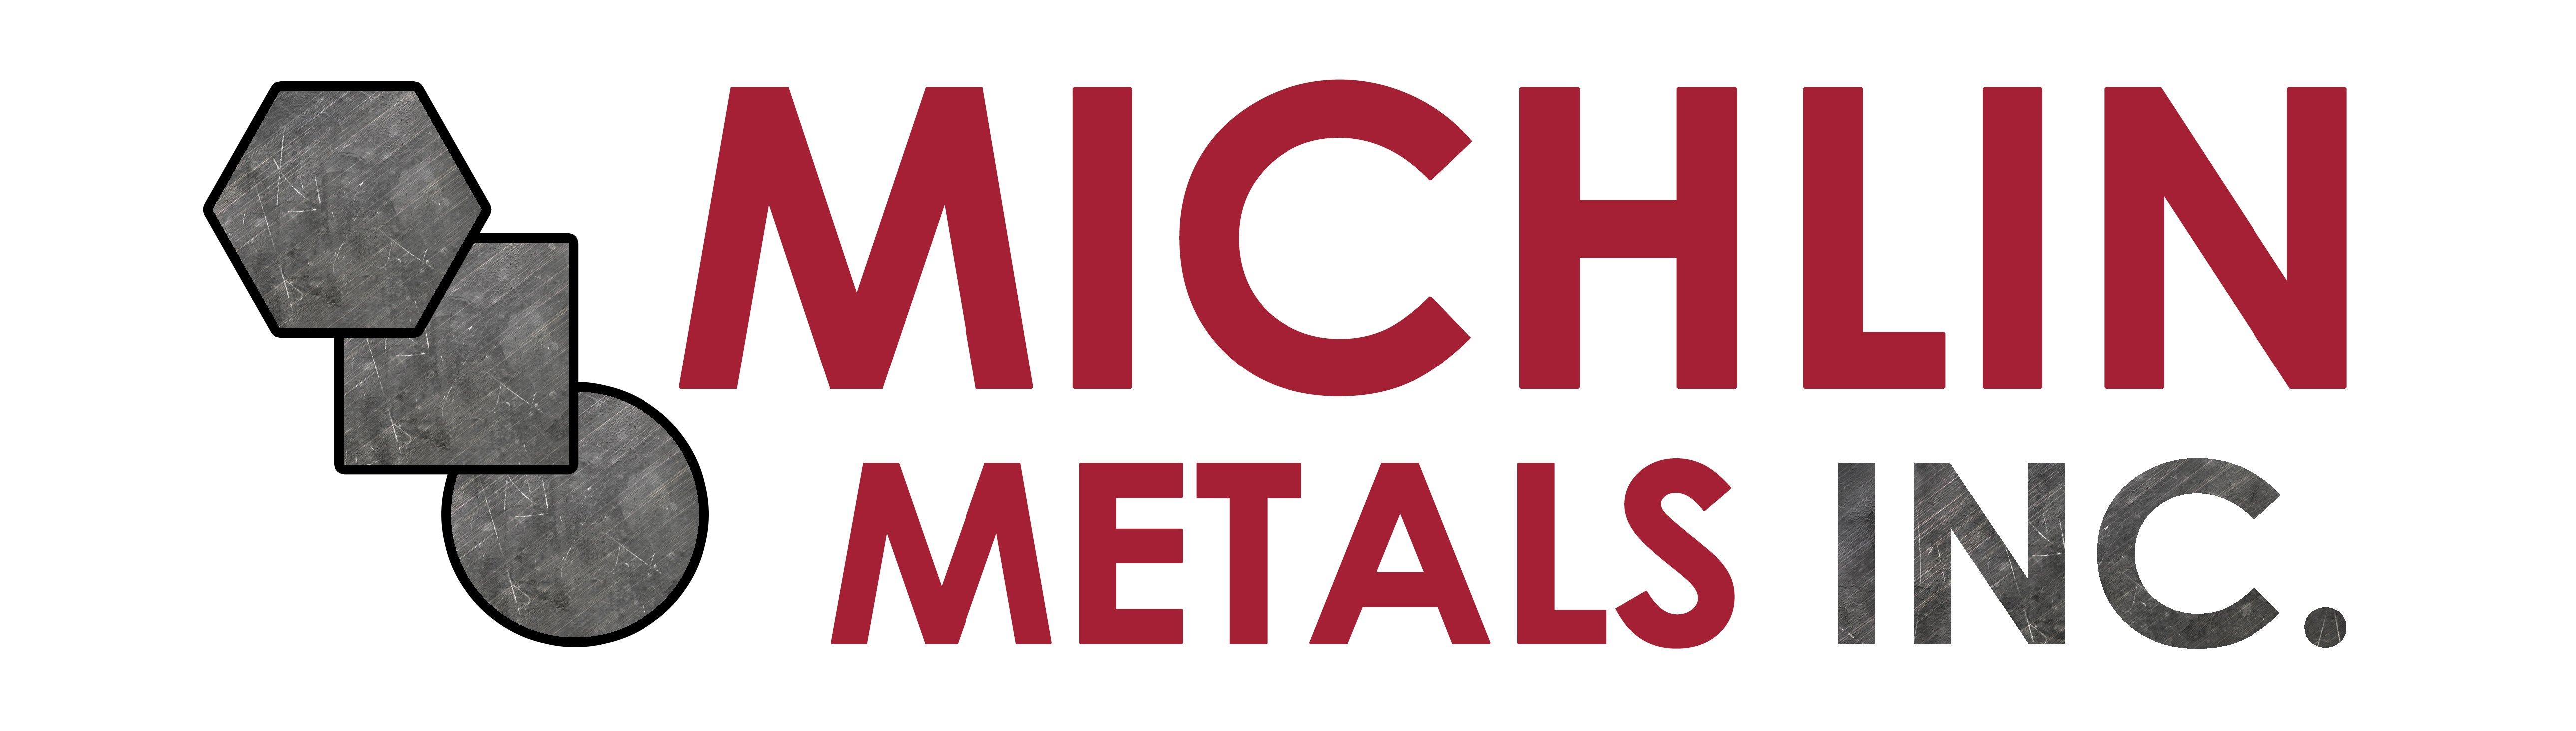 Michlin Metals Aerospace Steel Supplier